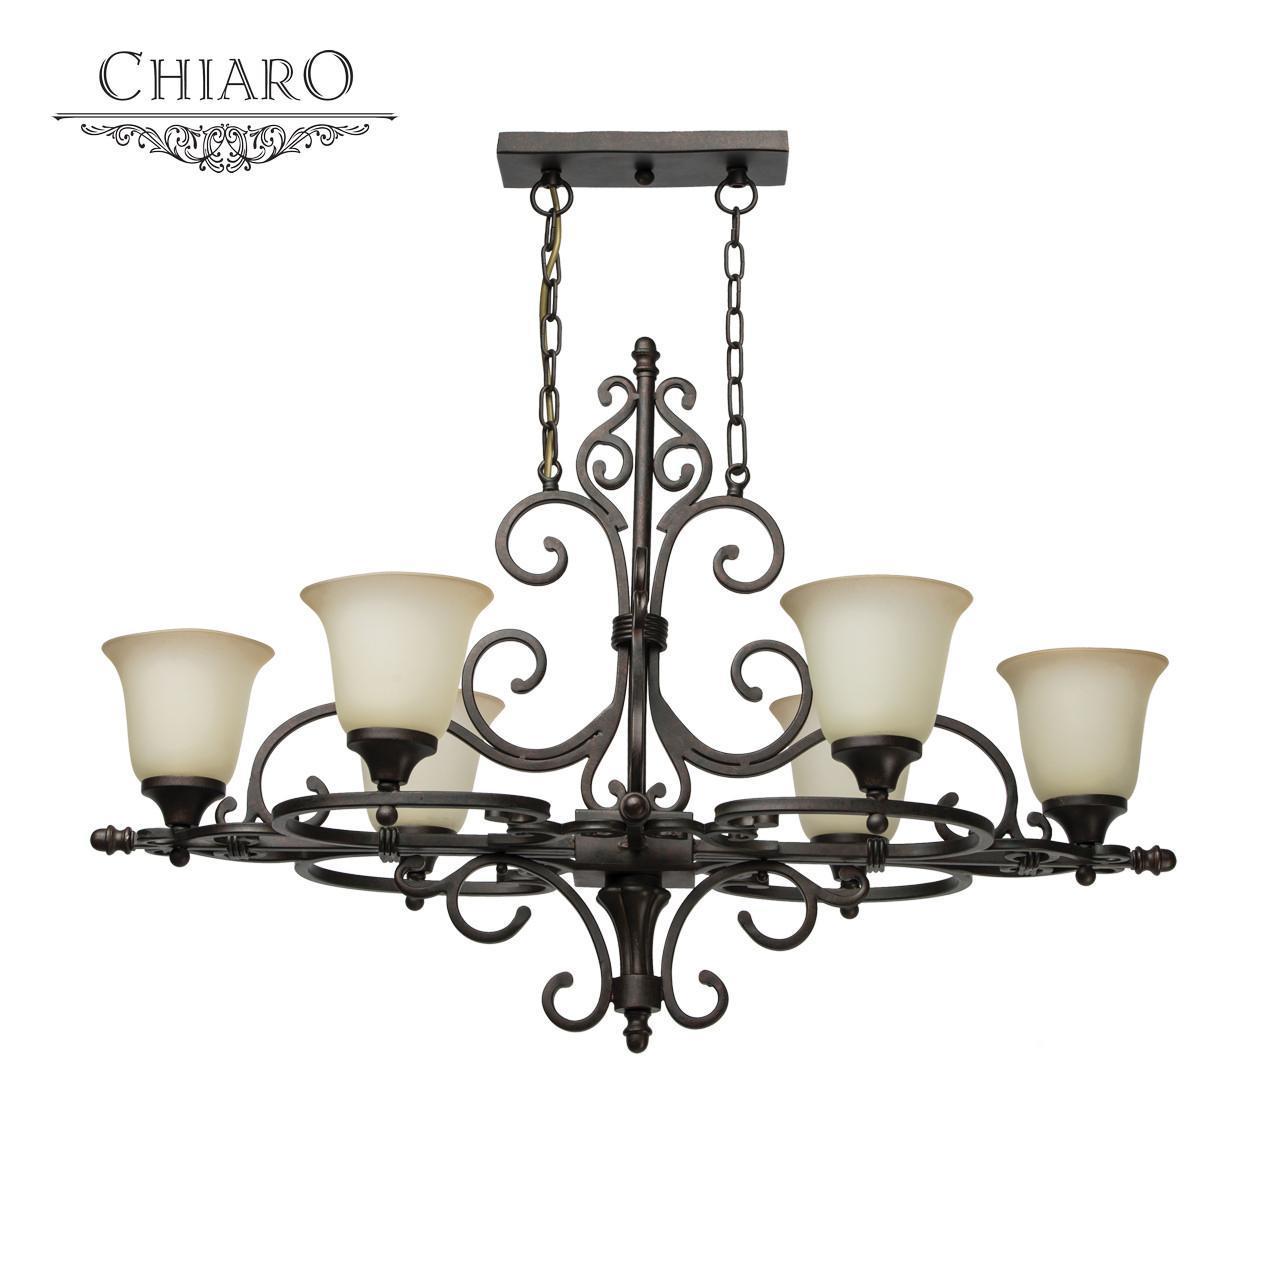 Люстра Chiaro Версаче 254015806 потолочная подвесная люстра chiaro версаче 4 254015806 page 5